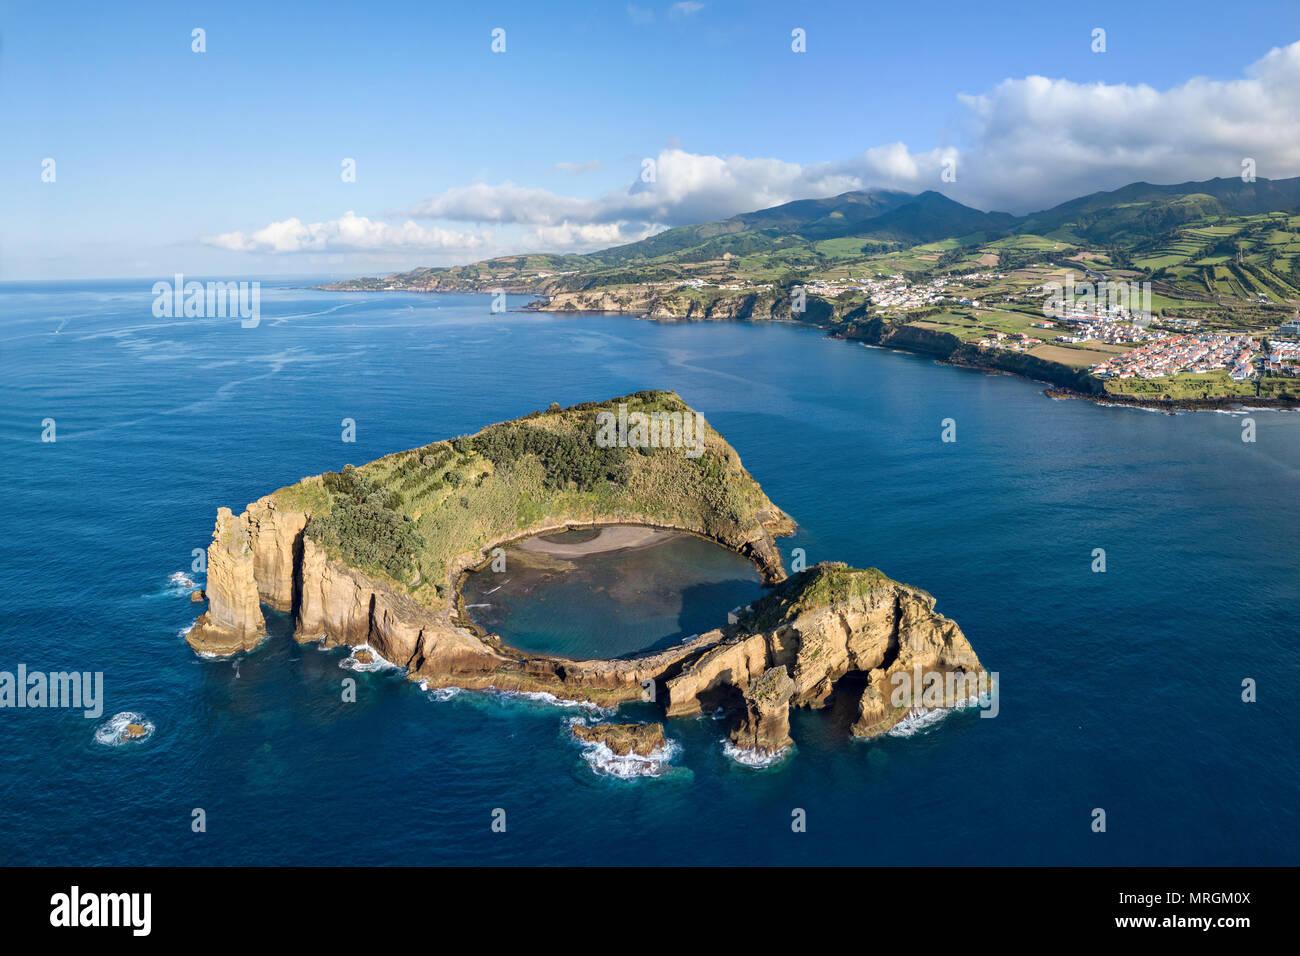 Islet of Vila Franca do Campo, Sao Miguel island, Azores, Portugal (aerial view) - Stock Image